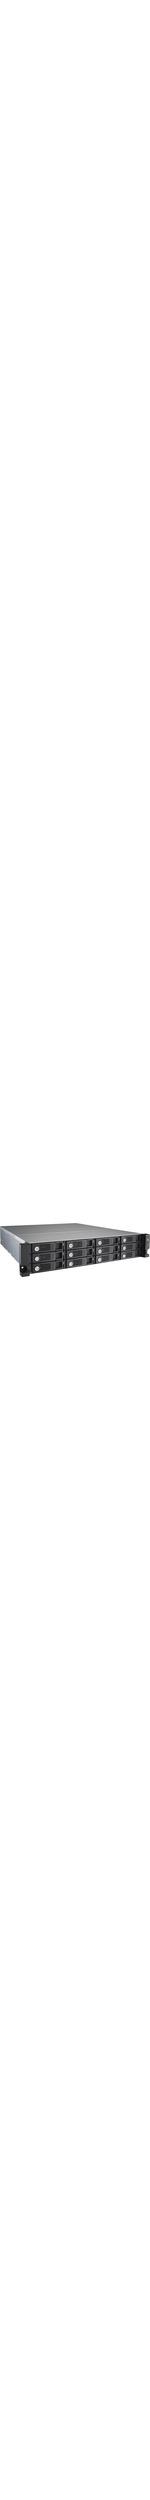 QNAP Turbo vNAS TVS-1271U-RP 12 x Total Bays SAN/NAS Server - 2U - Rack-mountable - Intel Core i5